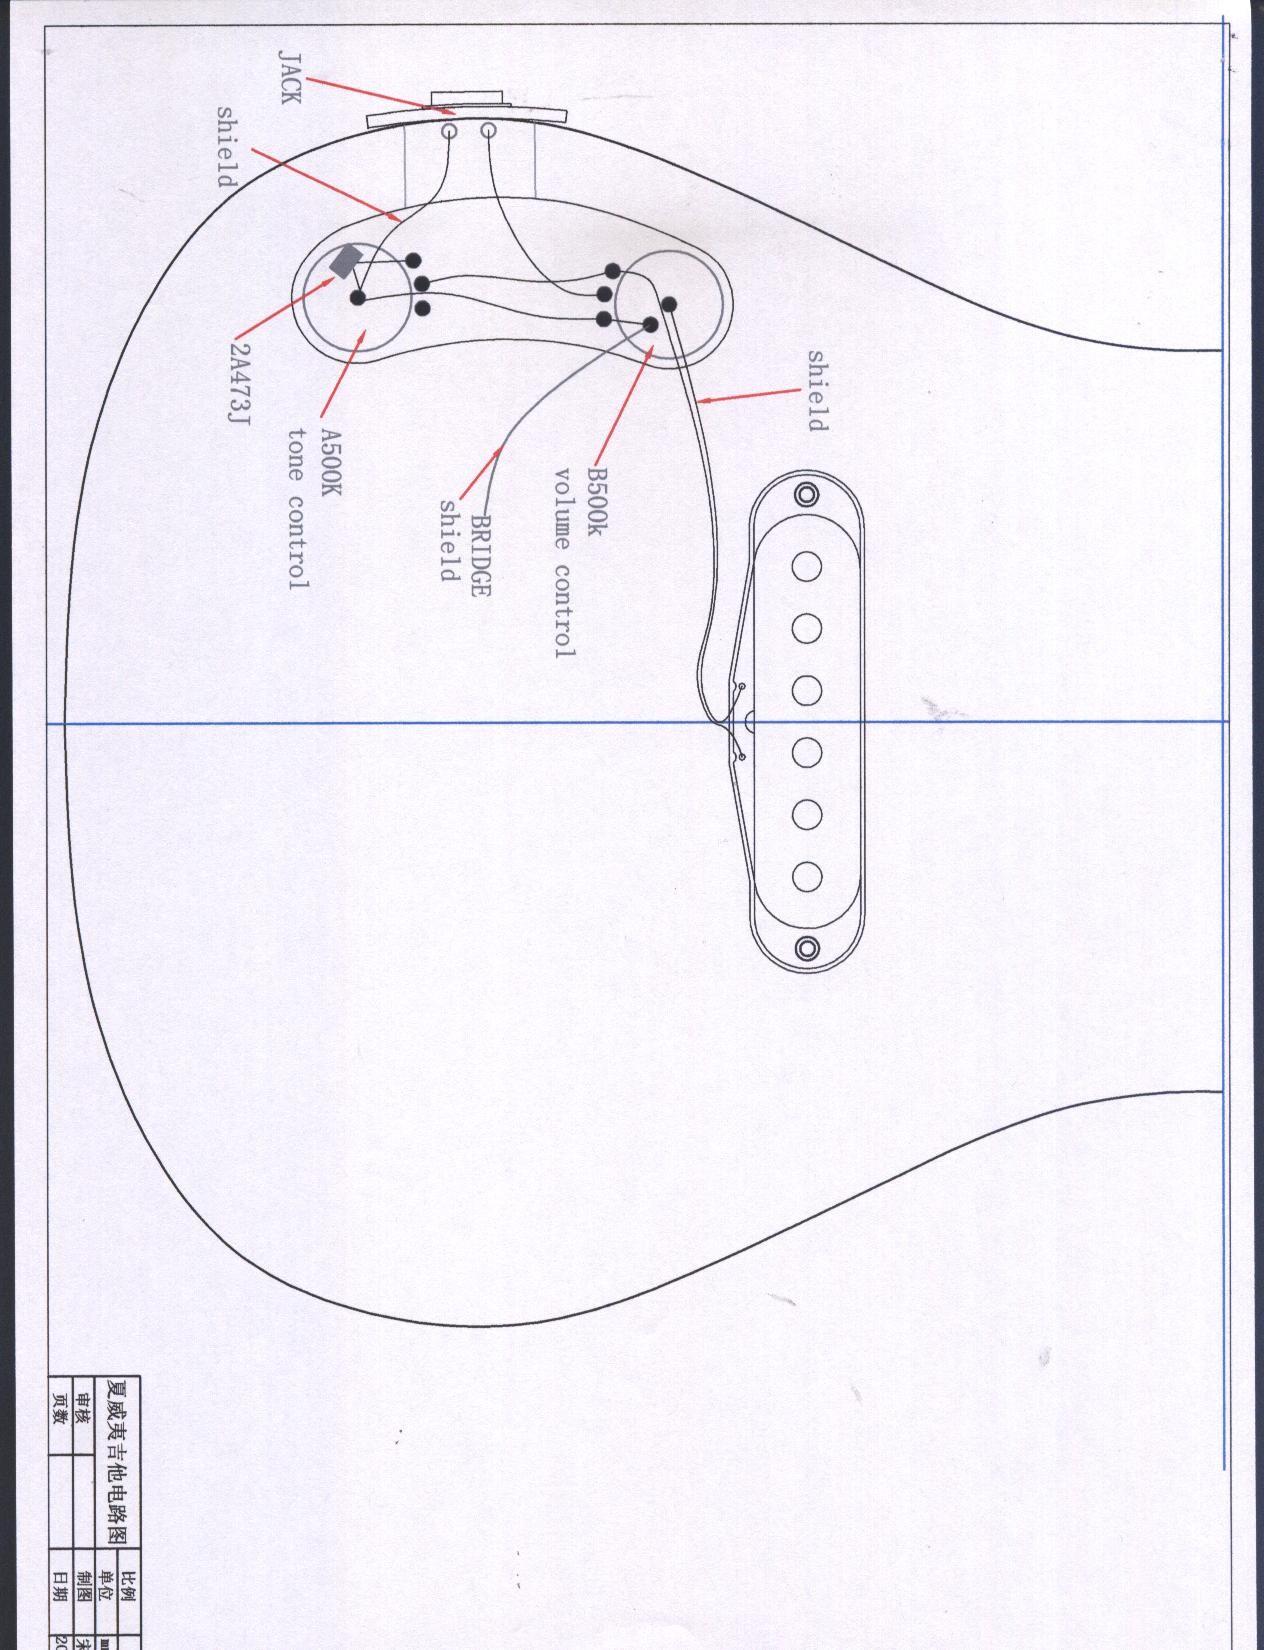 Les Paul Pickup Wiring Besides 2 Humbucker Wiring Diagrams As Well Emg